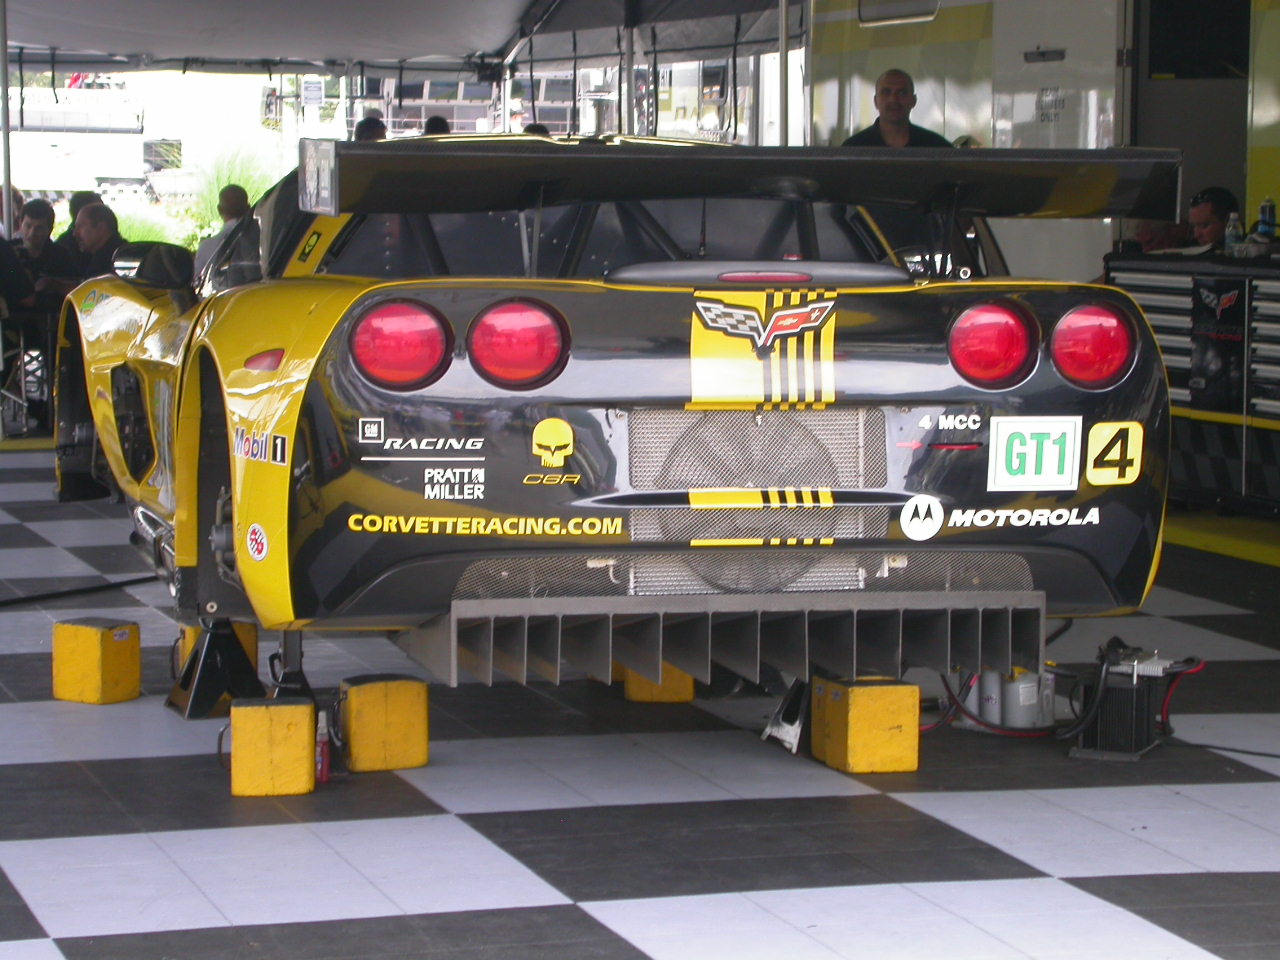 Corvette Racing: